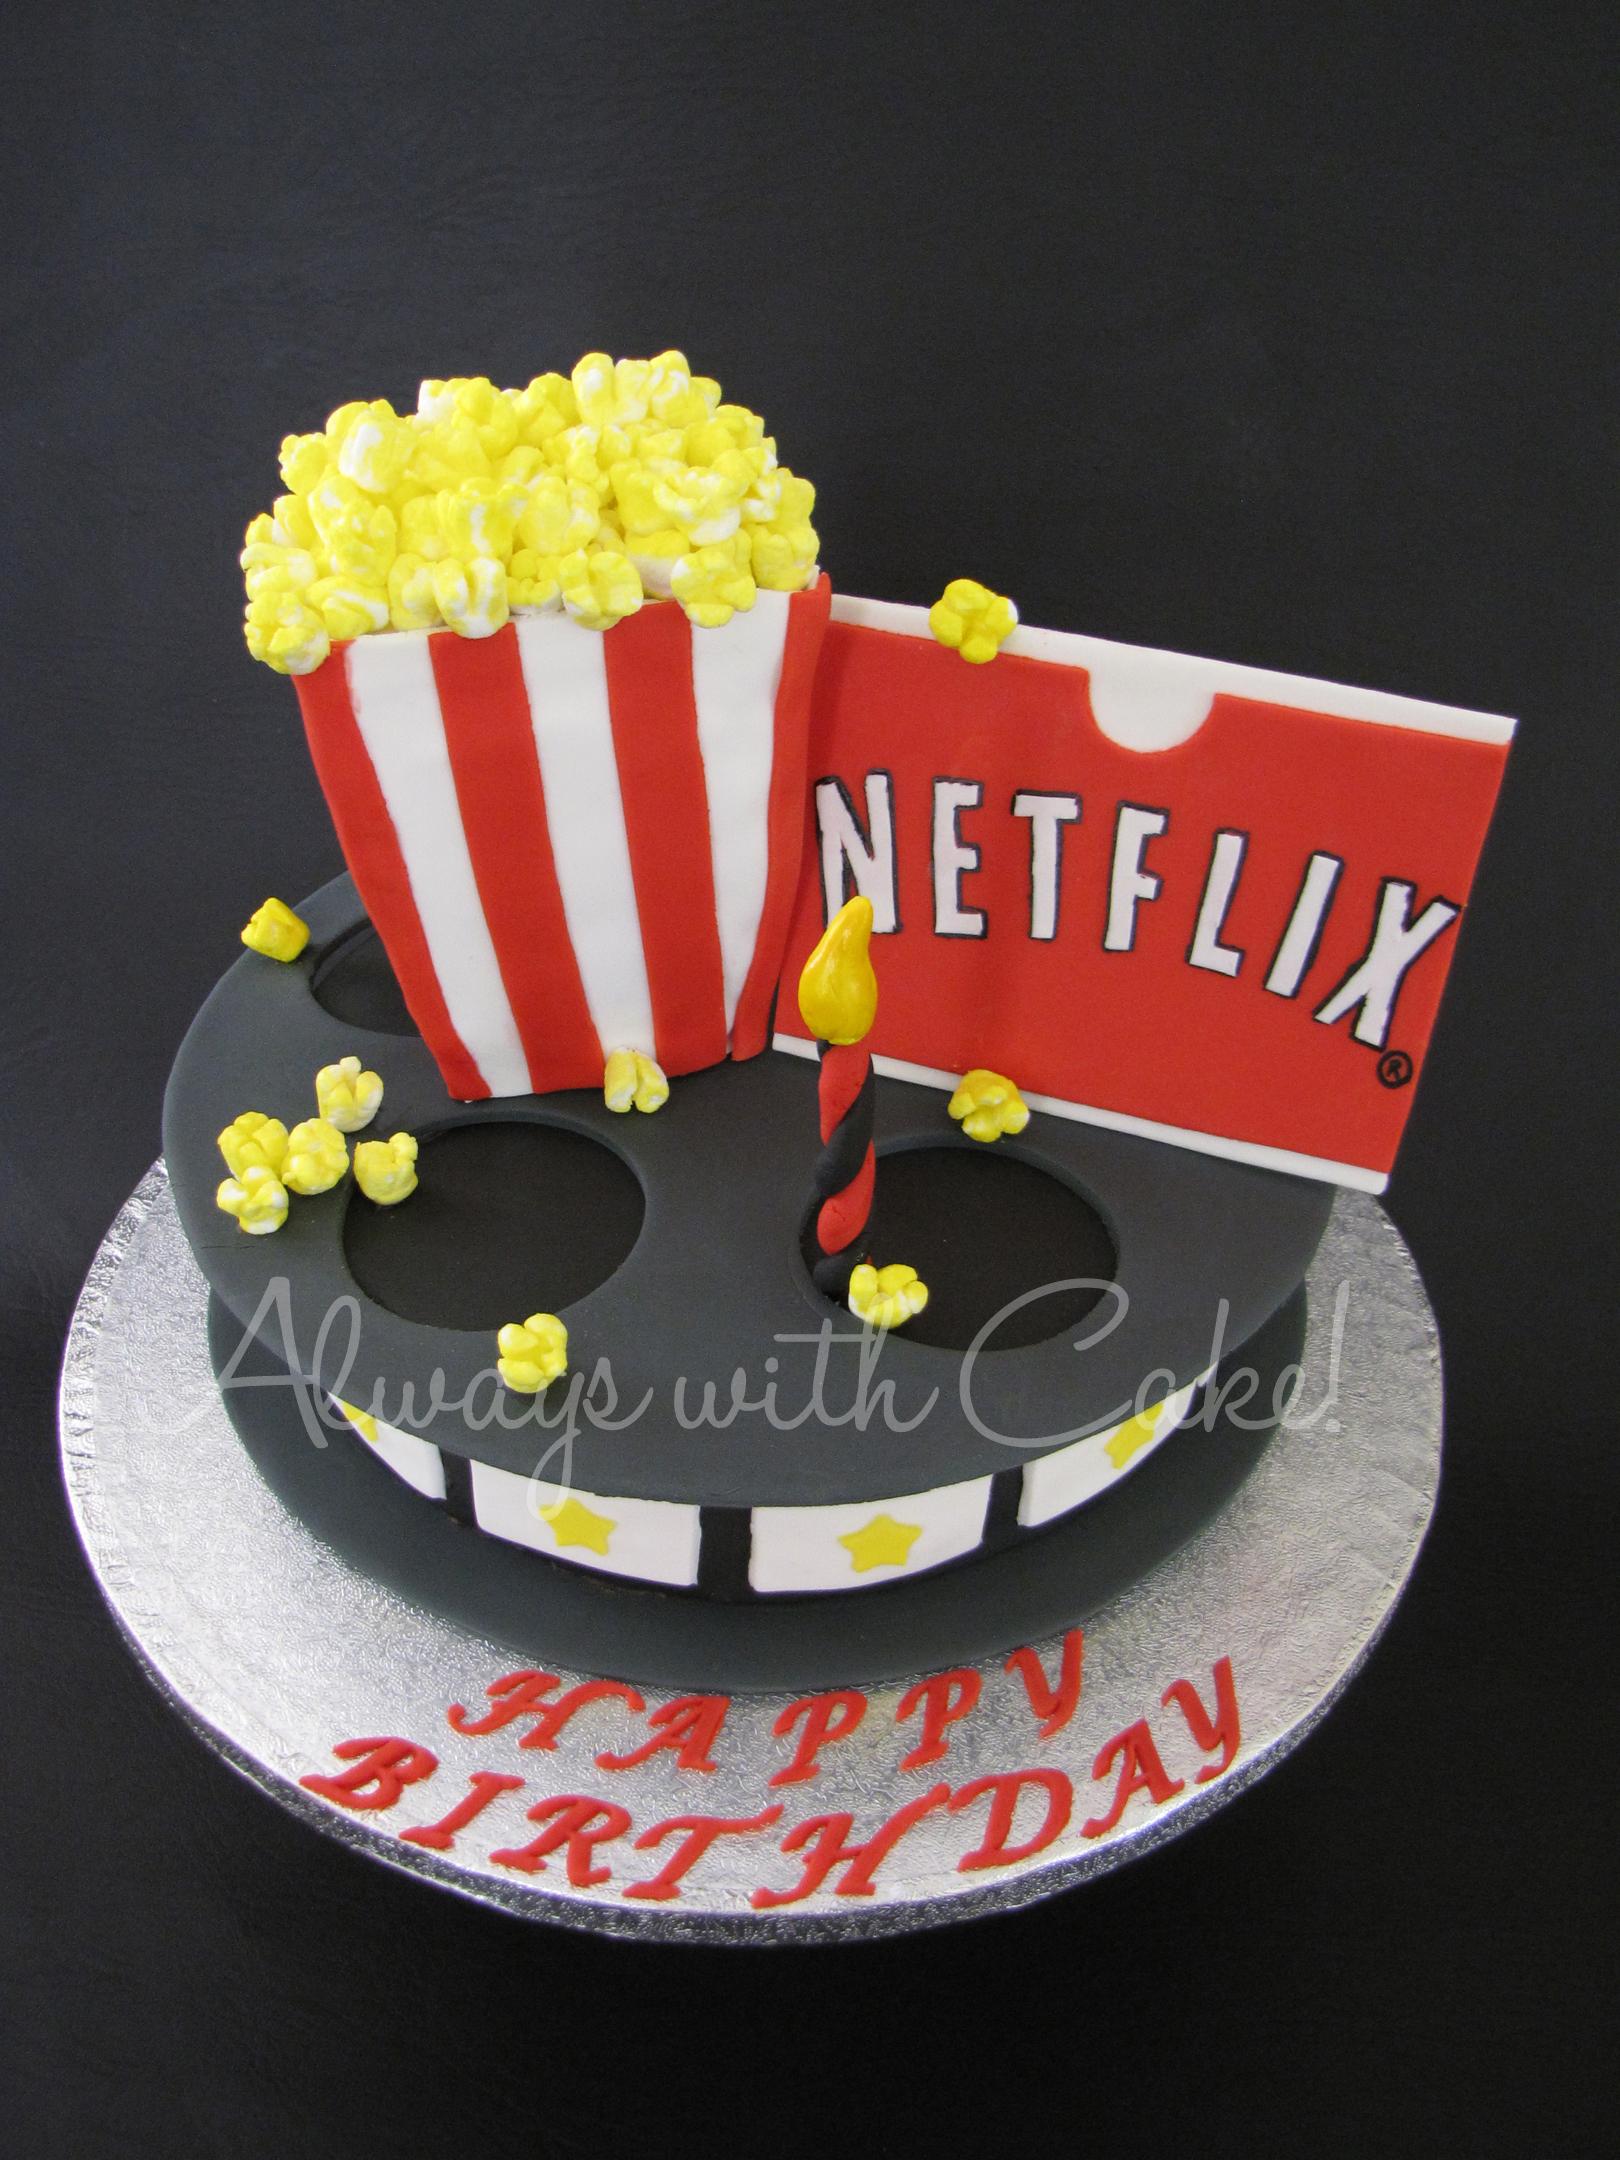 A night for a movie Birthday Cake